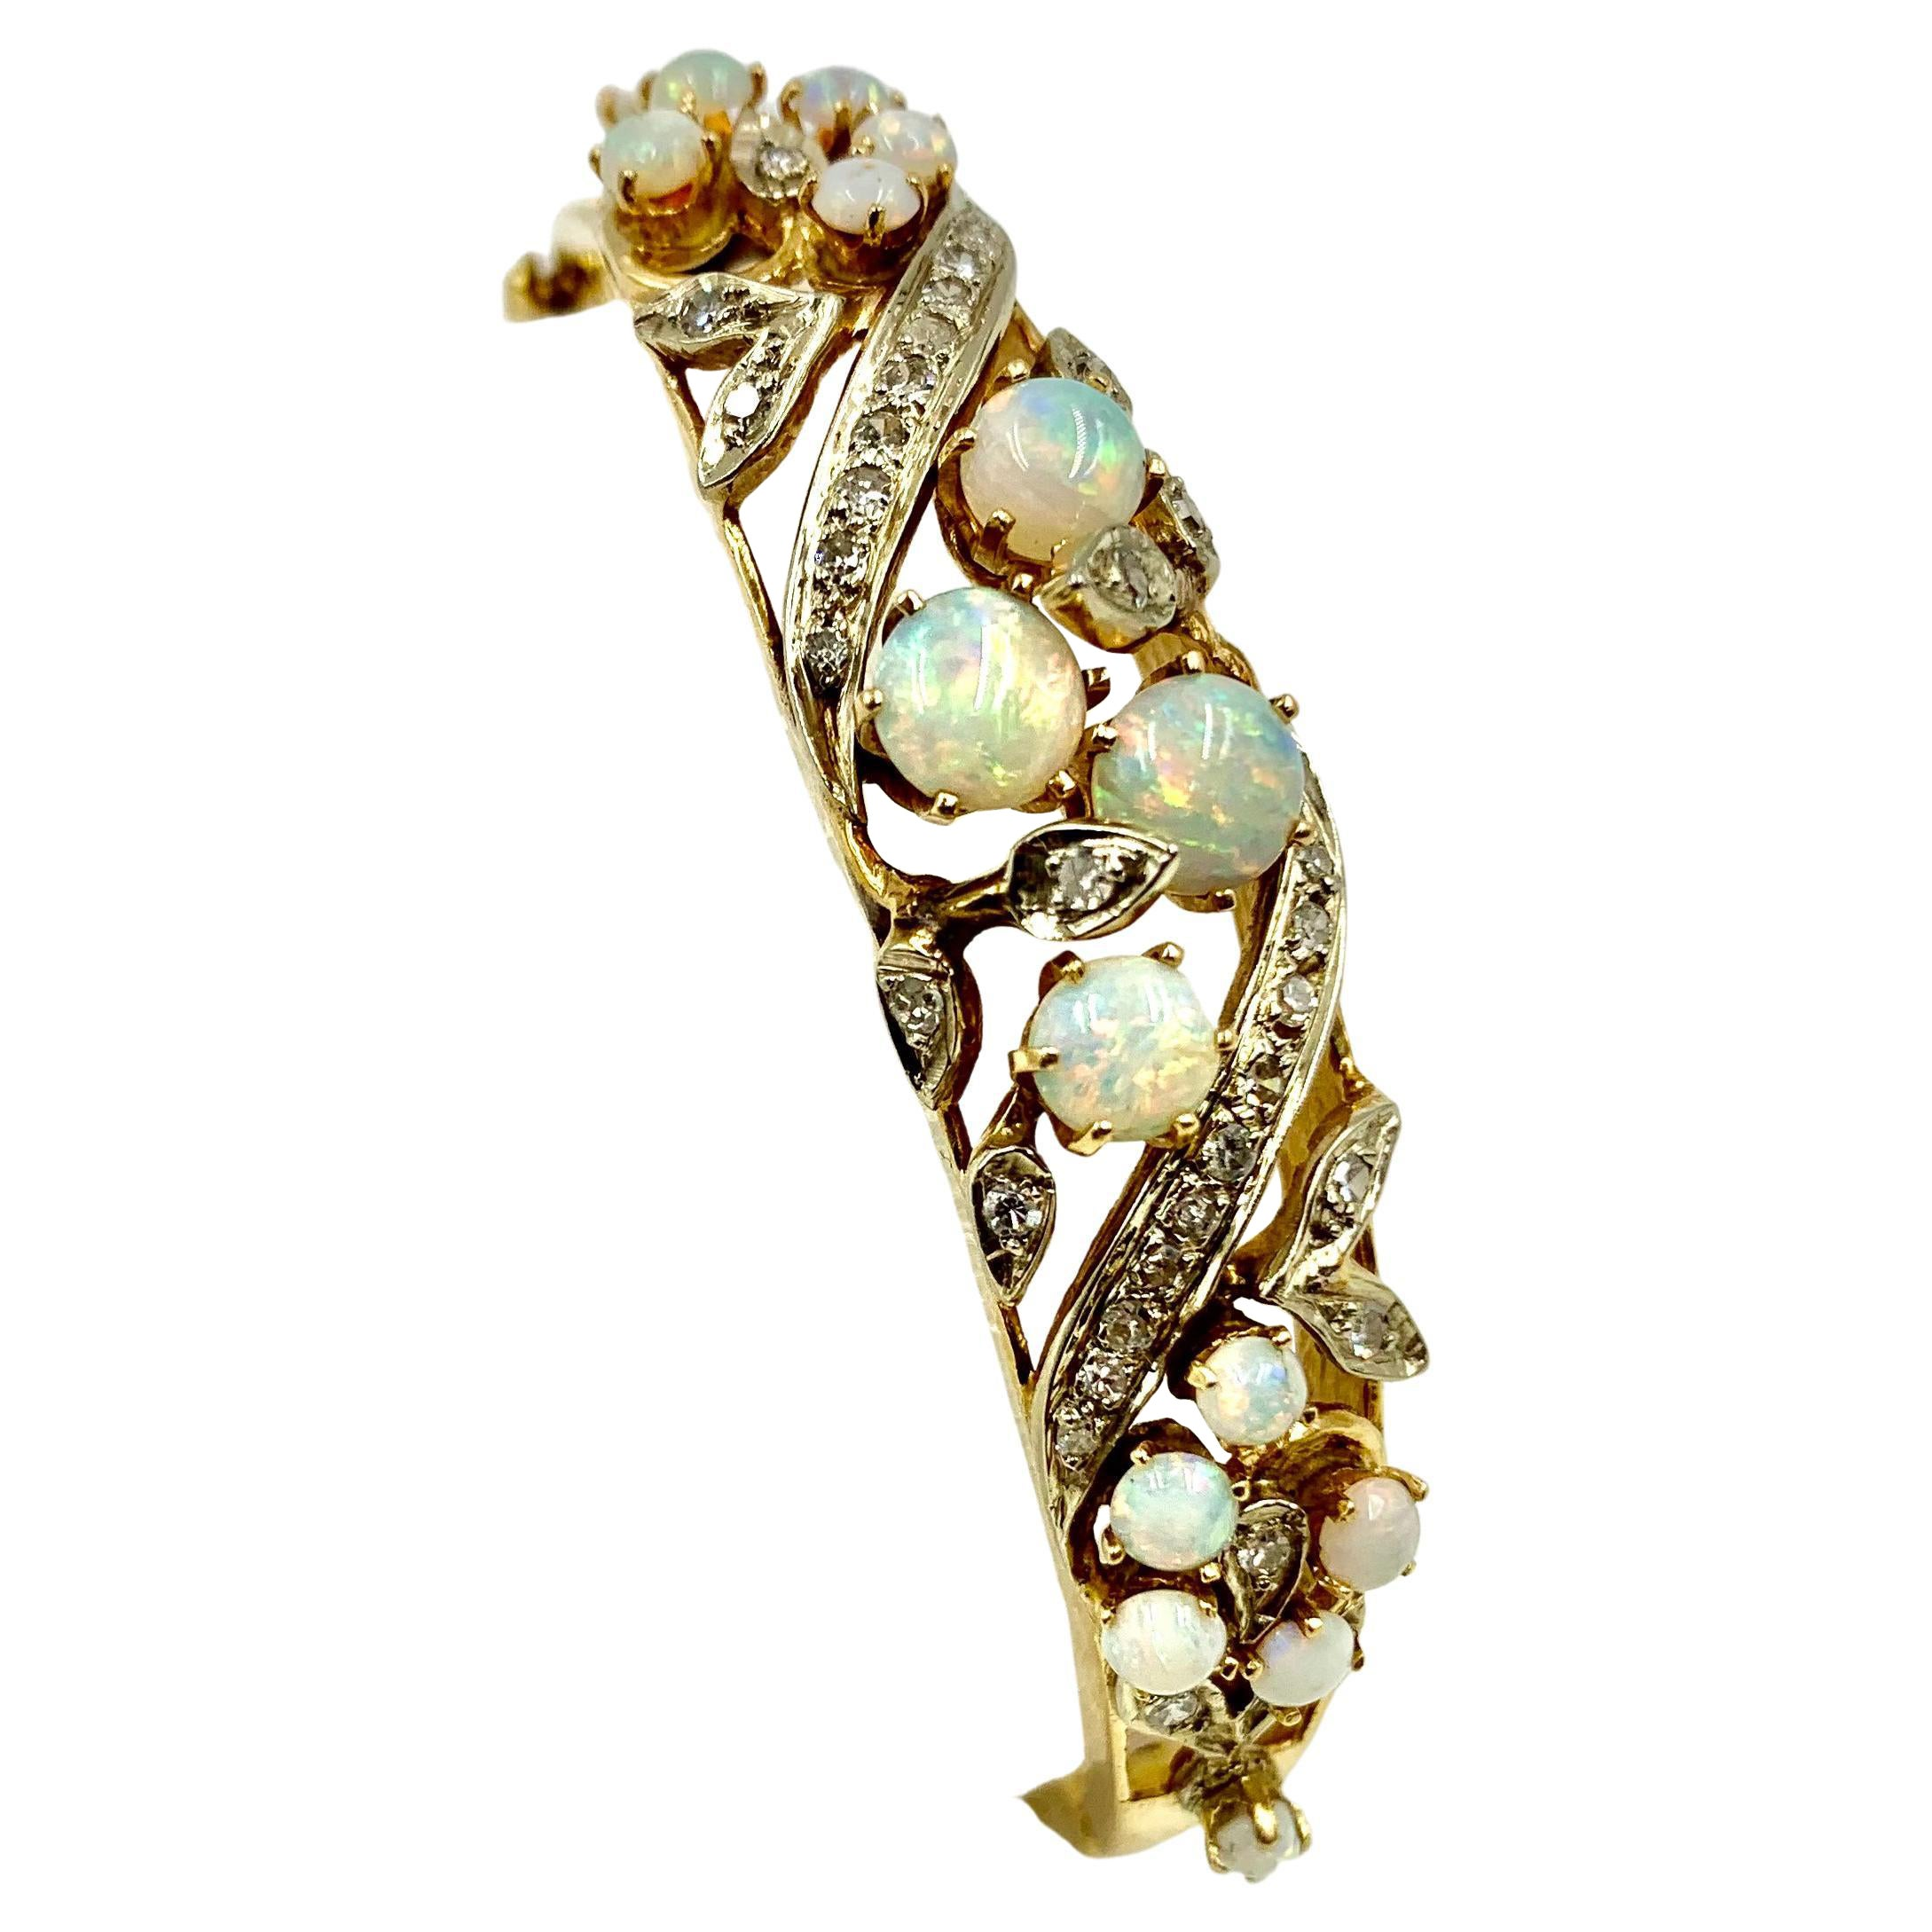 Antique Edwardian Diamond Opal 14K Gold Bracelet